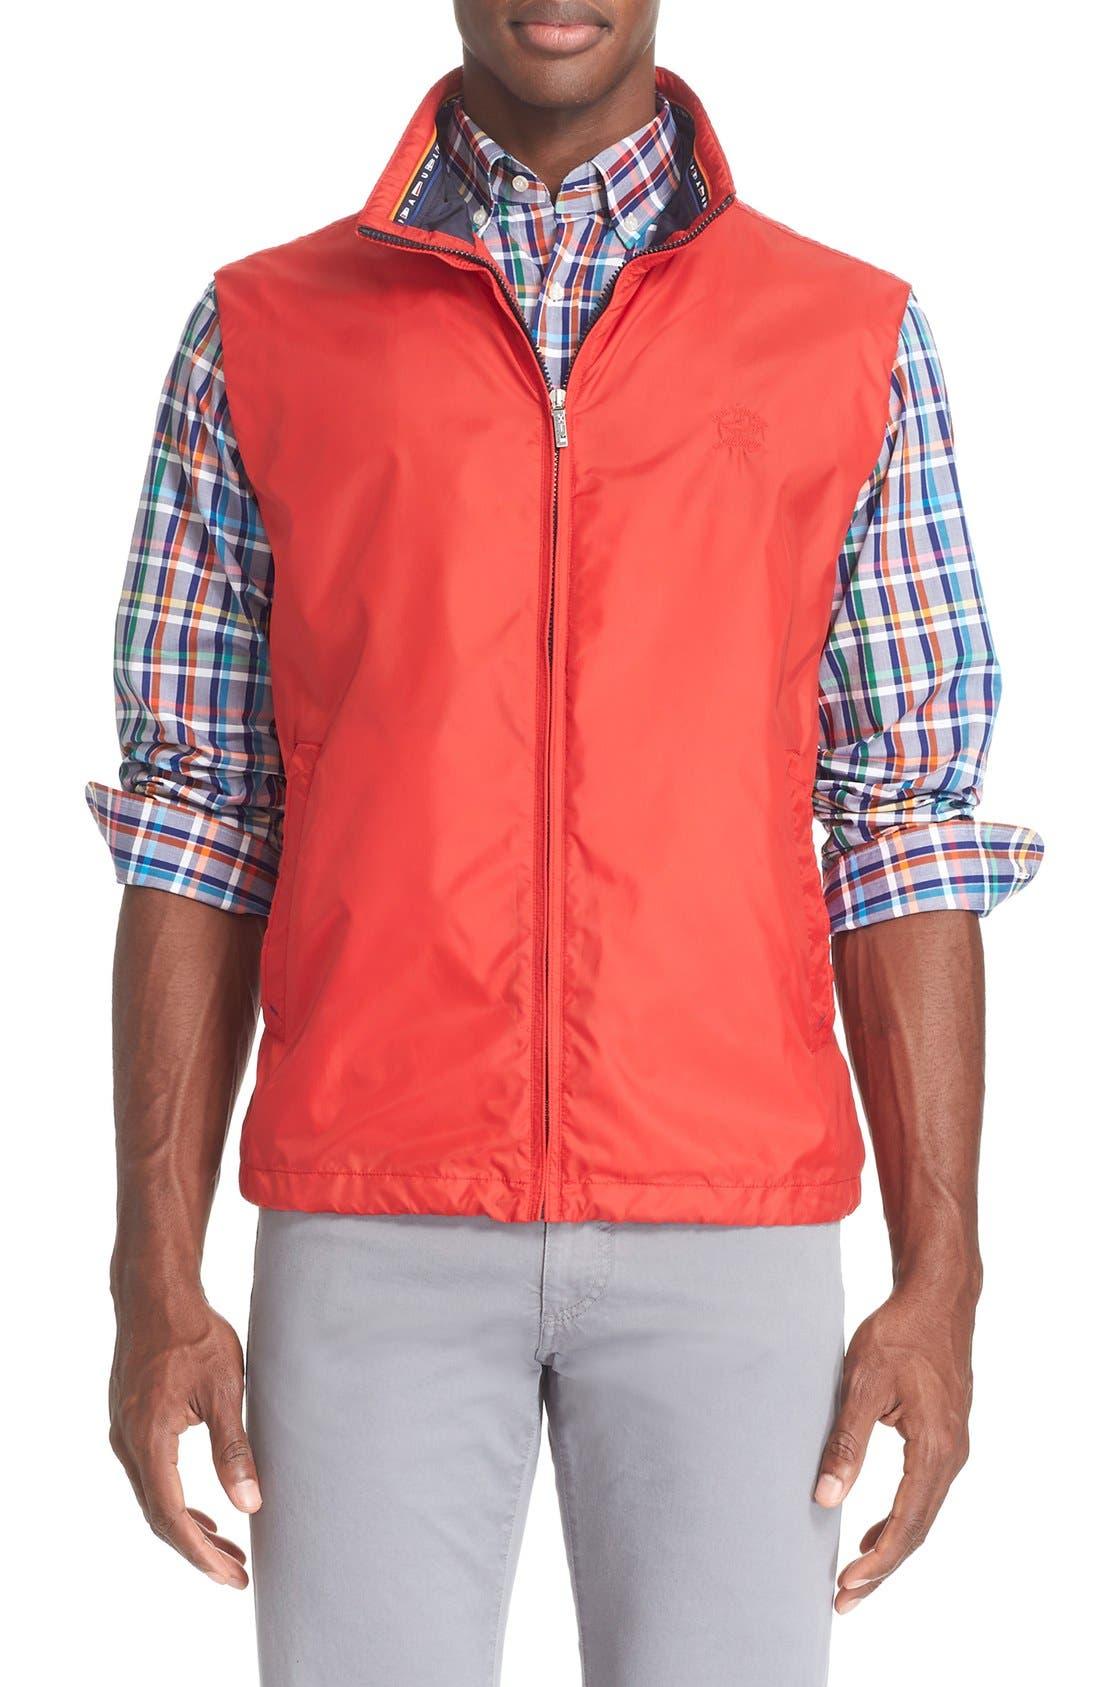 'Yachting' Vest,                             Main thumbnail 1, color,                             600